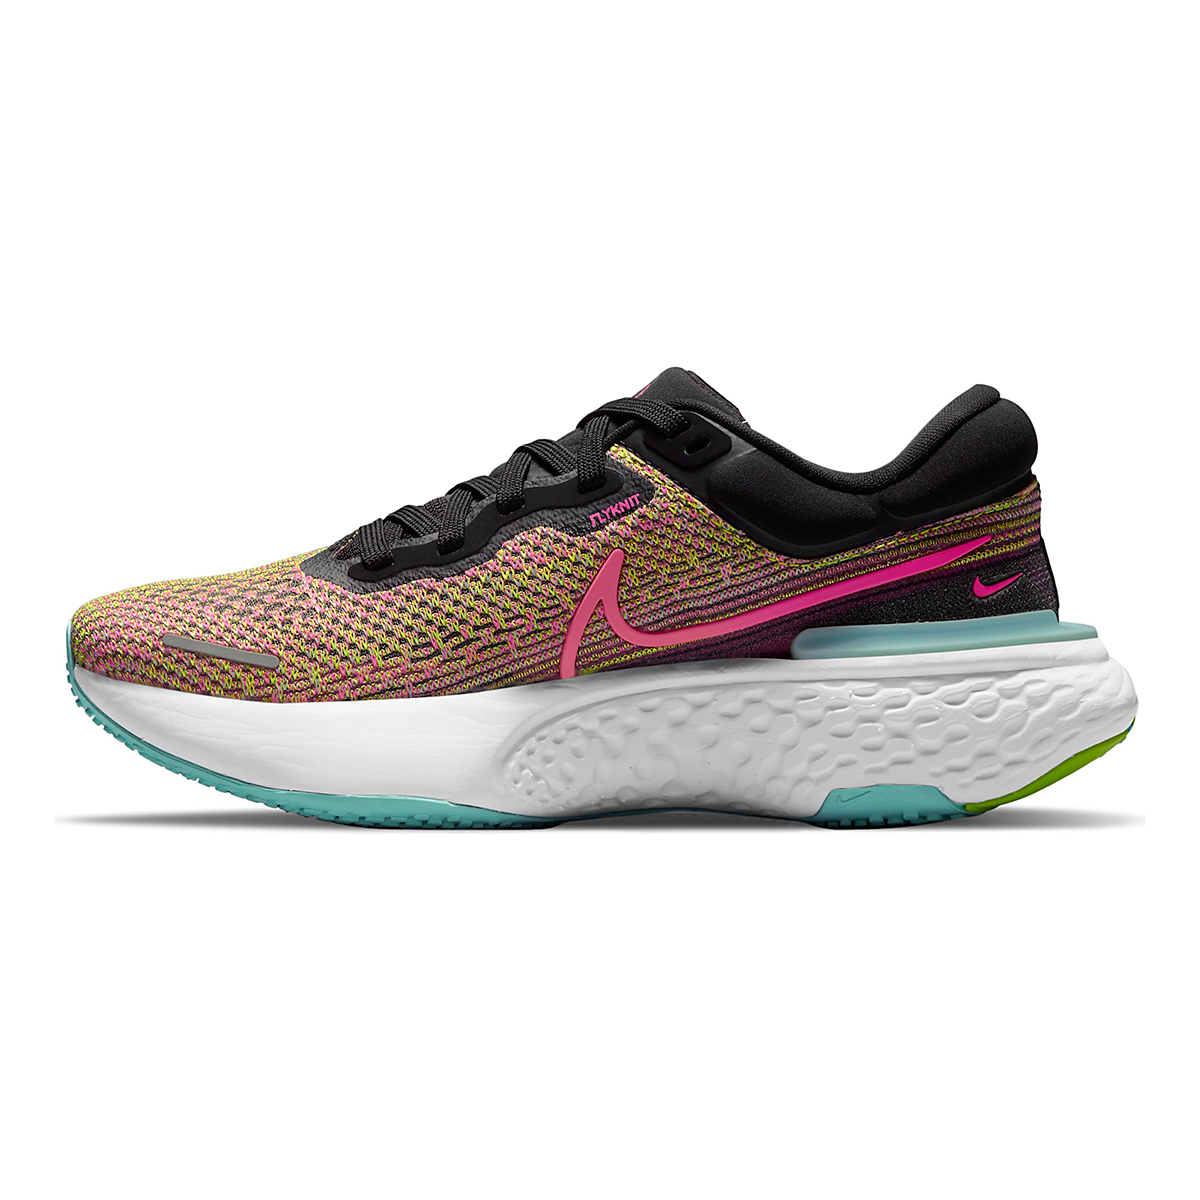 Women's Nike Zoomx Invincible Run FlyKnit Running Shoe - Color: Volt/Bright Mango/Black/Light Dew - Size: 5 - Width: Regular, Volt/Bright Mango/Black/Light Dew, large, image 2